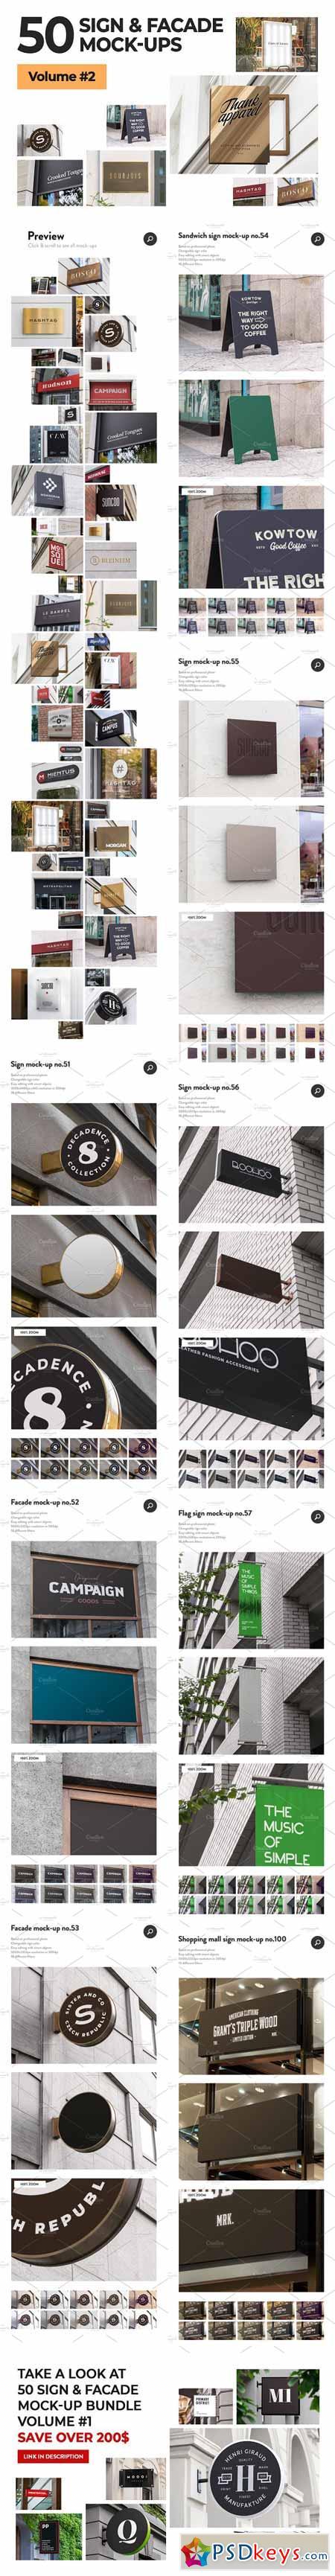 50 sign facade logo mockup bundle 2 3270315